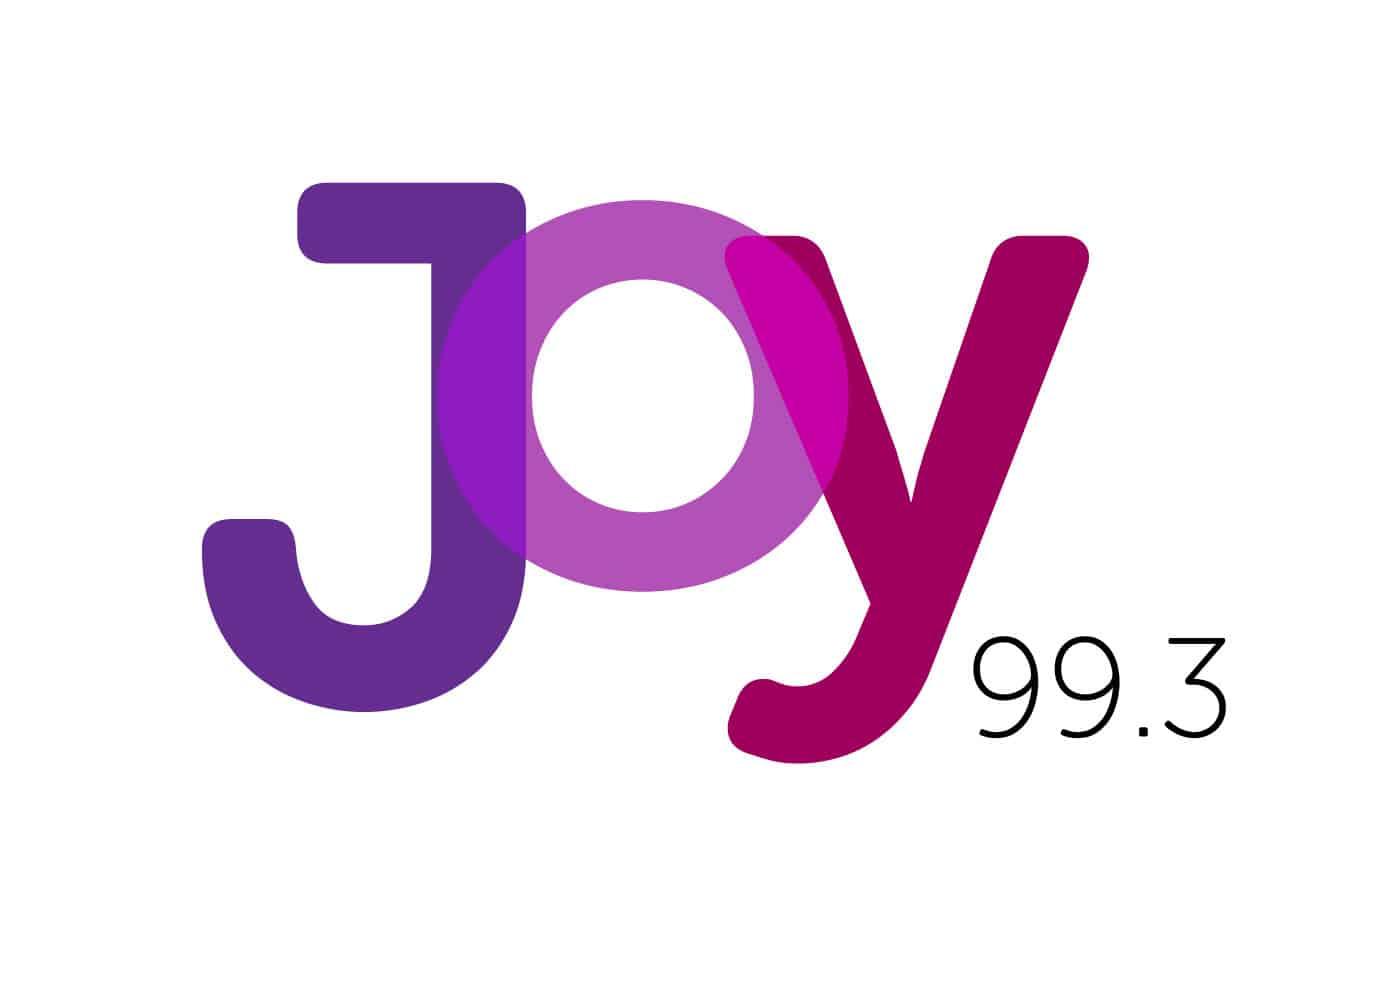 JOY99 3 | Encouraging your life | West Michigan Christian